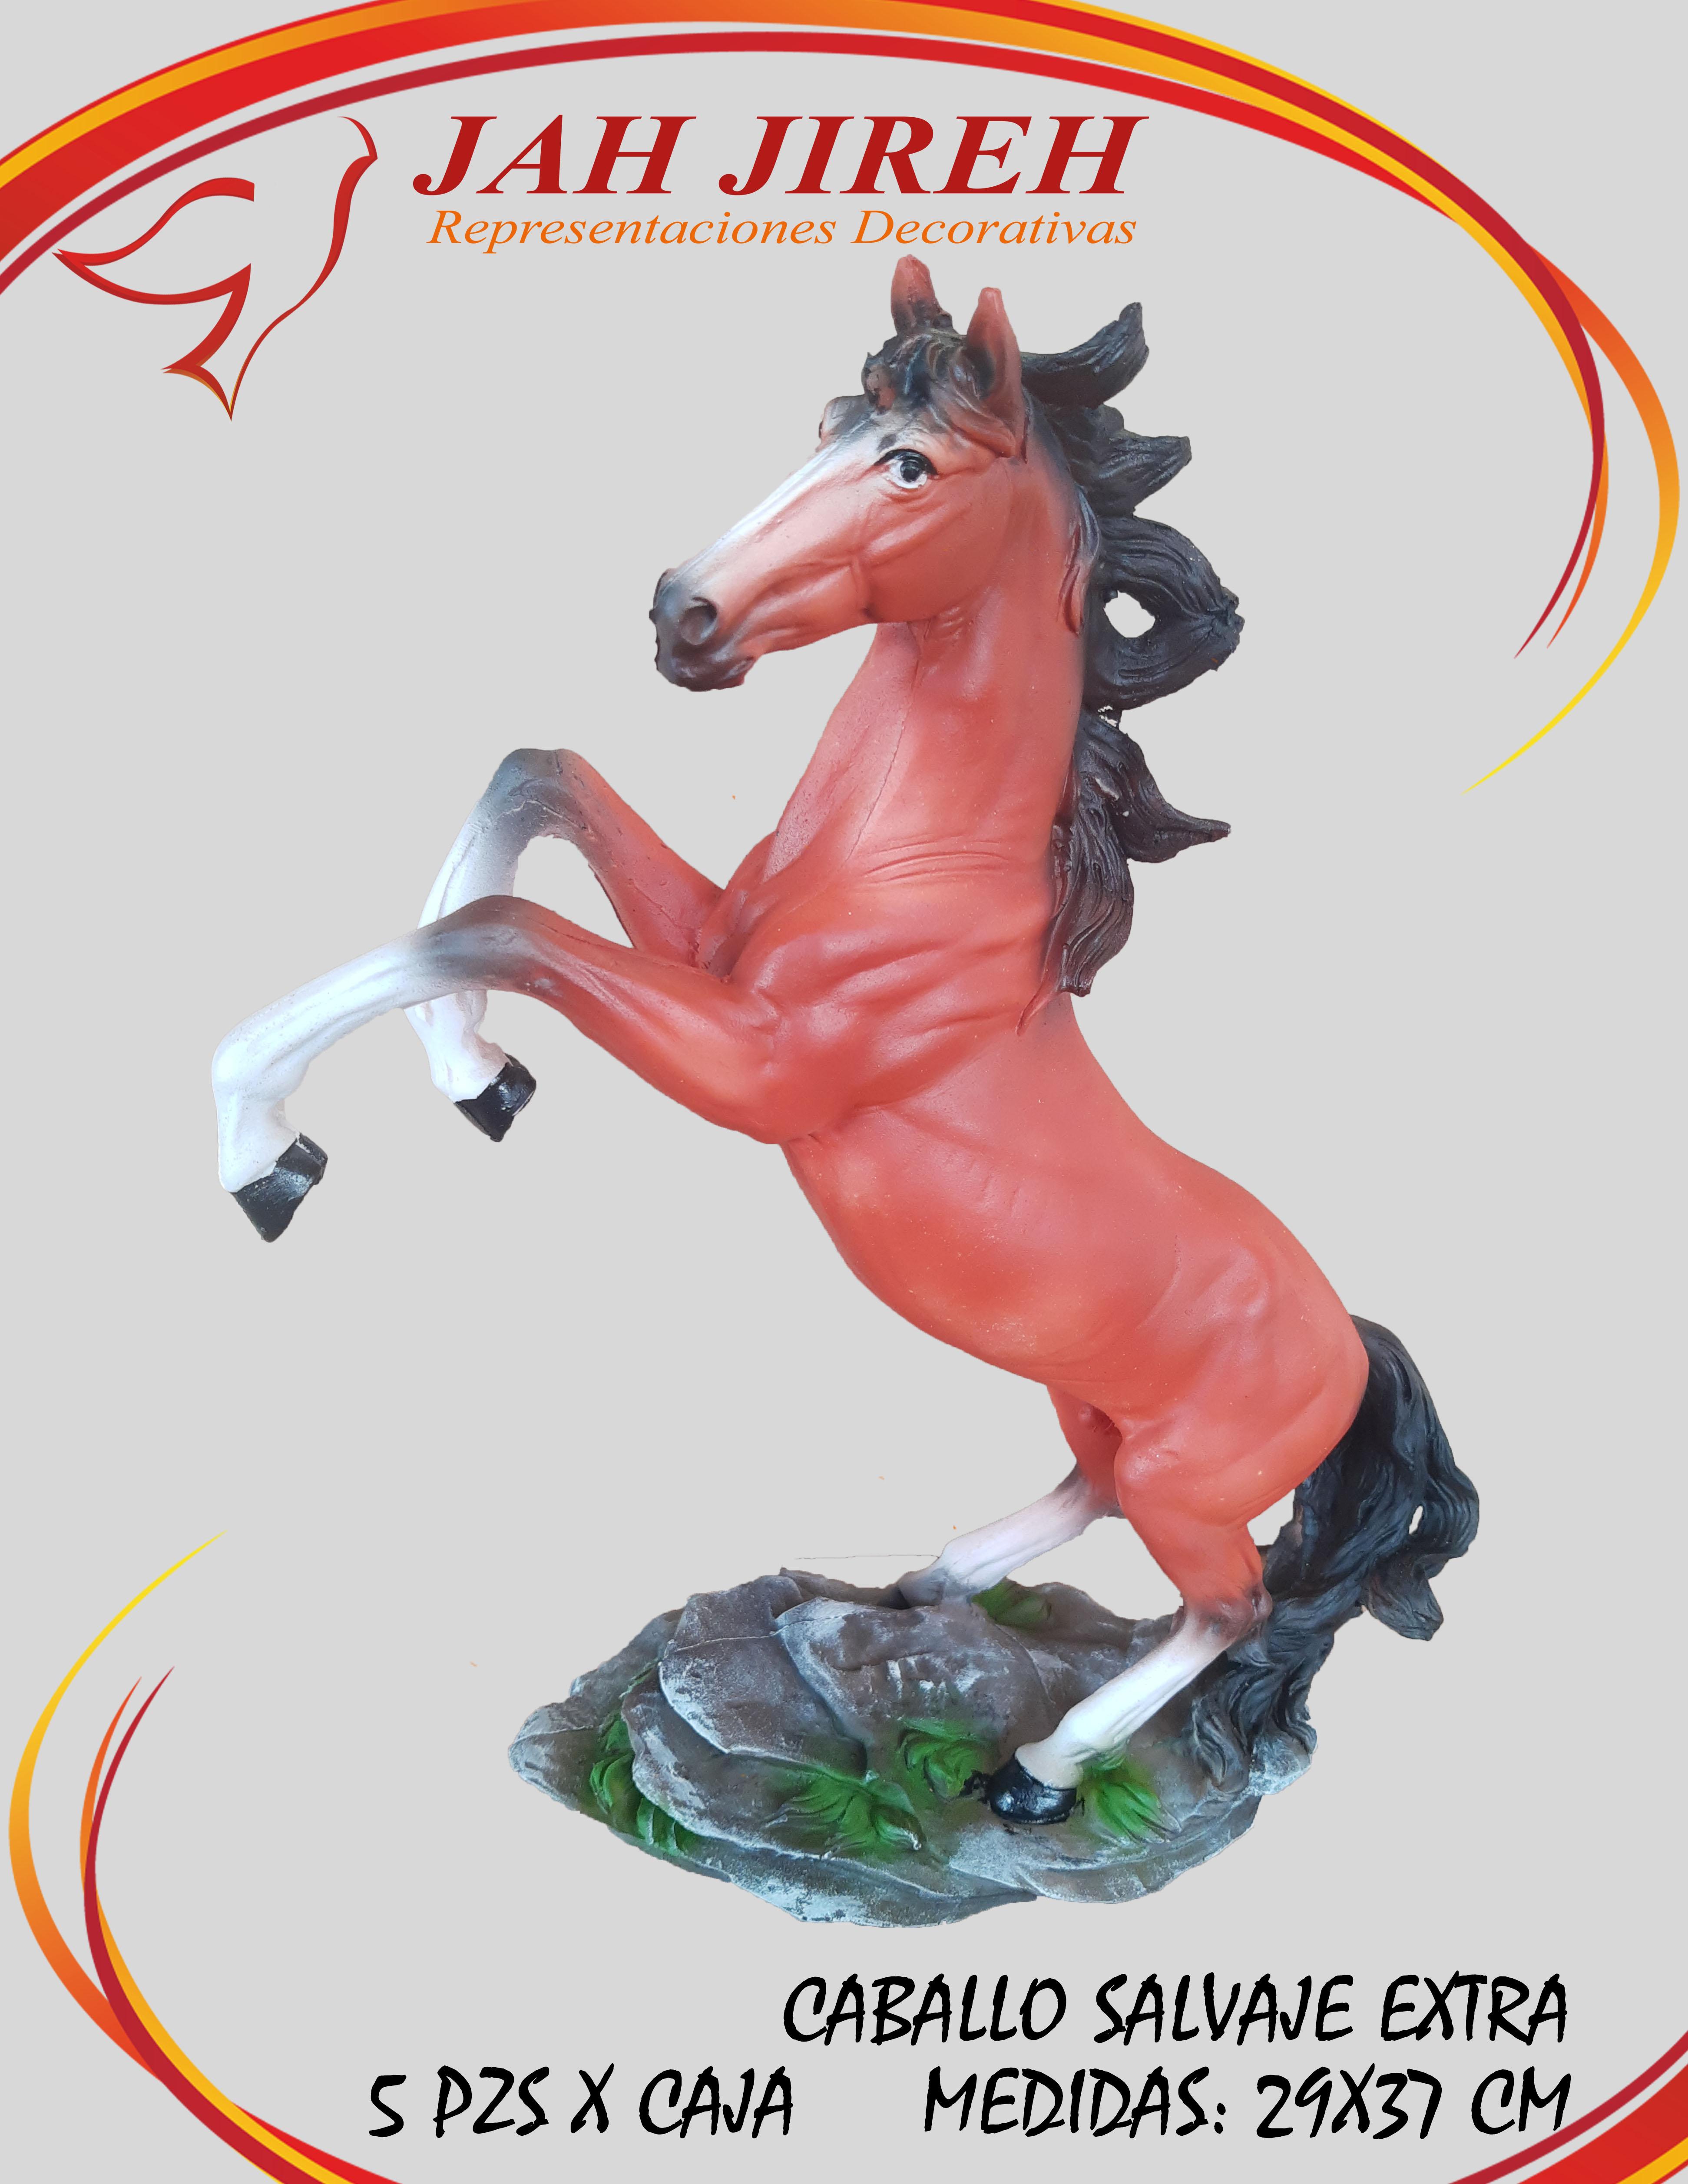 https://0201.nccdn.net/1_2/000/000/140/5f0/caballo-salvaje-extra.jpg